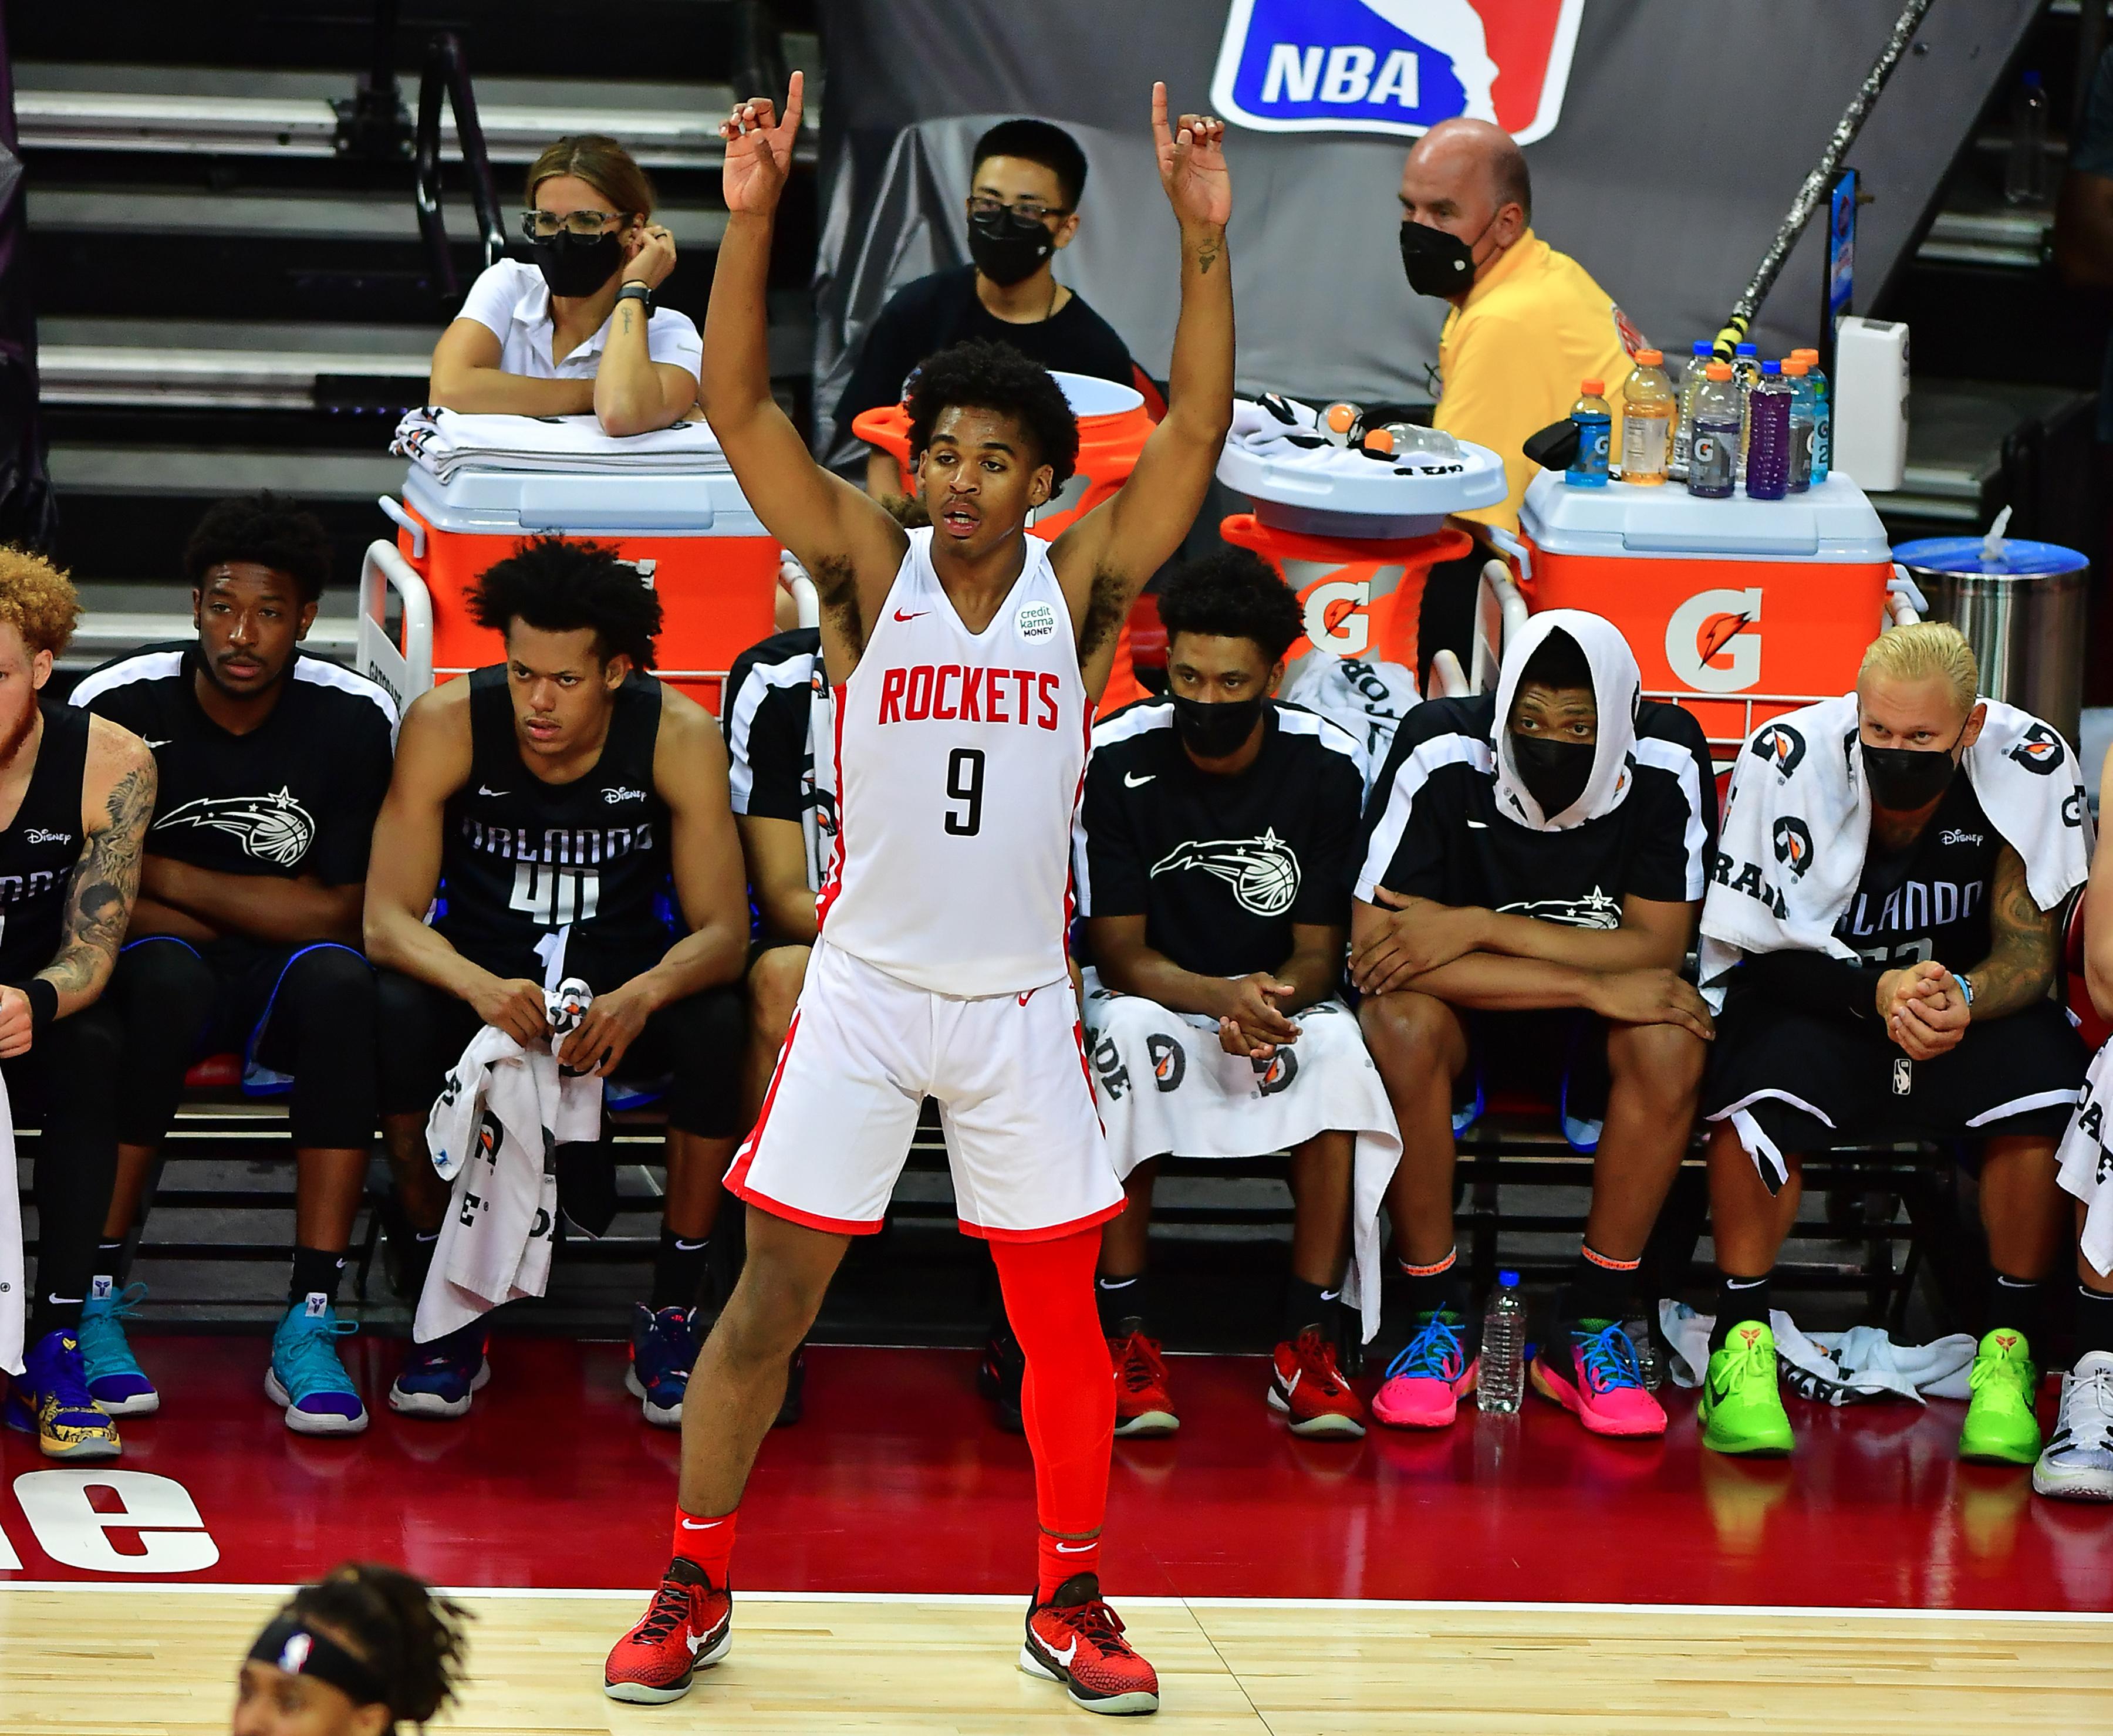 NBA: Summer League-Orlando Magic at Houston Rockets